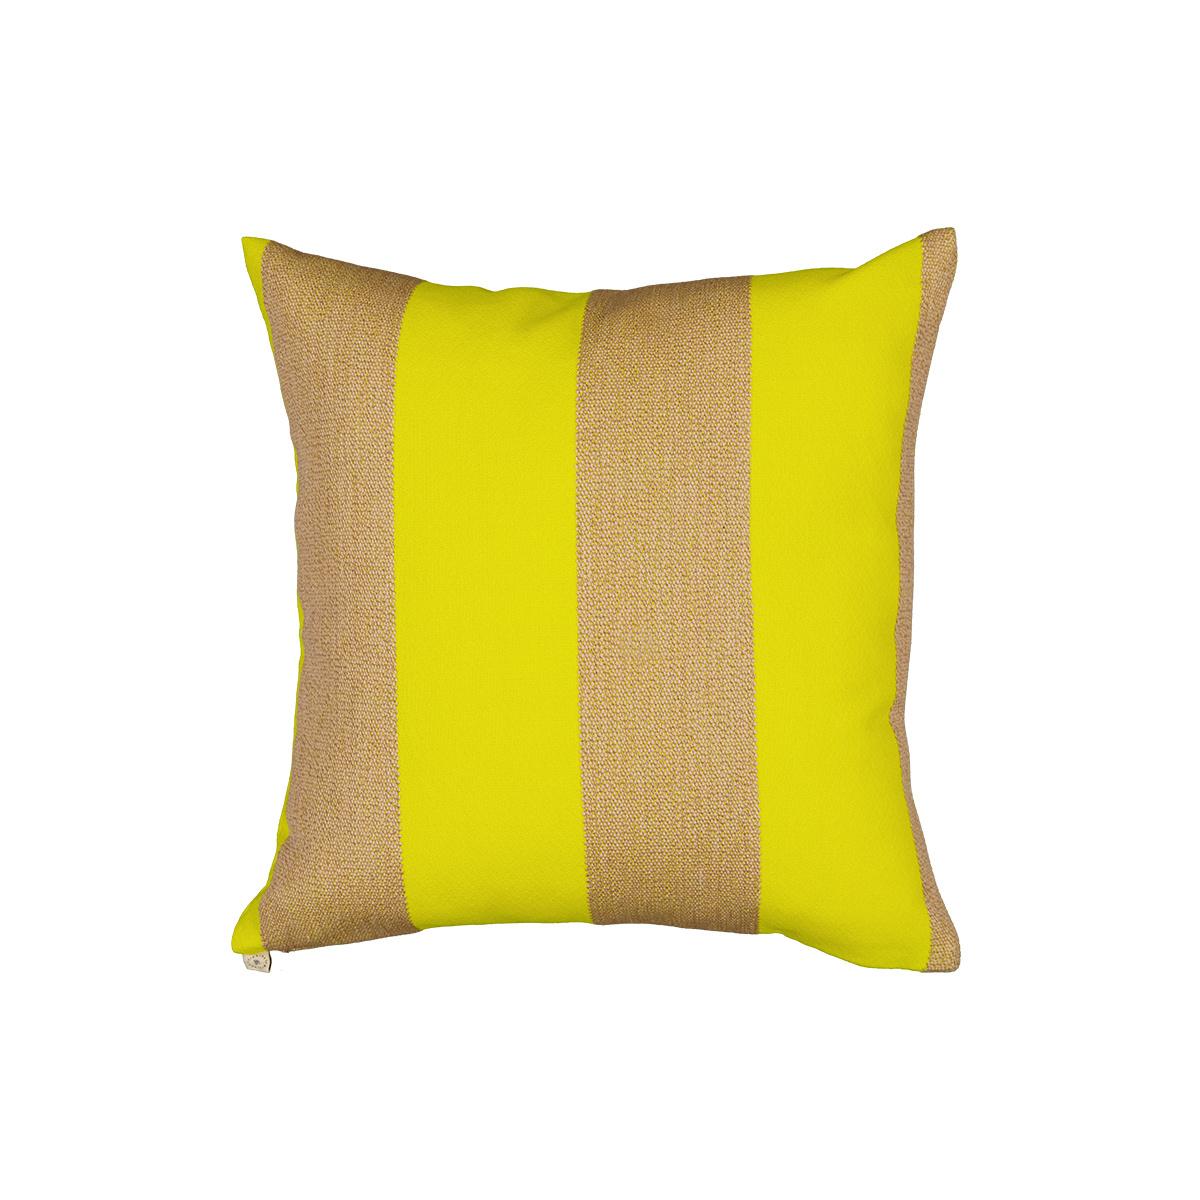 Viaggio Cushion Yellow Kvadrat / Raf Simons